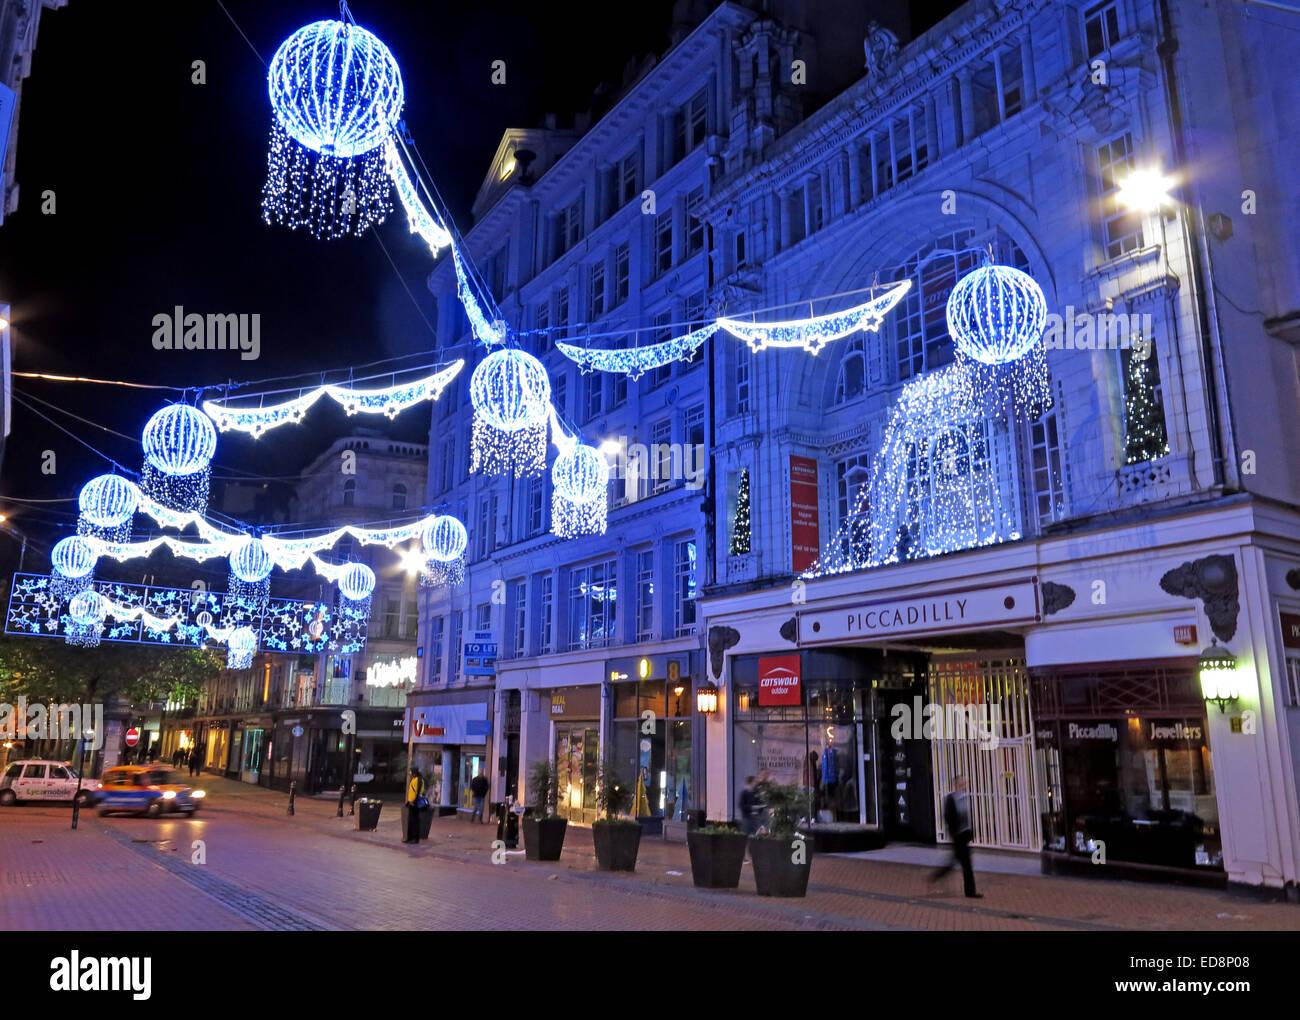 GB,United Kingdom,Great Britain,Christmas,New Street,shopping,shops,retail,festive,yuletide,nighttime,evening,dusk,blue,picadilly,piccadilly,arcade,West Midlands,England,UK,at,Night,decorated,Divali,annual,suspended,overhead,hanging,shopper,shopping,empty,lonely,Gotonysmith,frankfurt